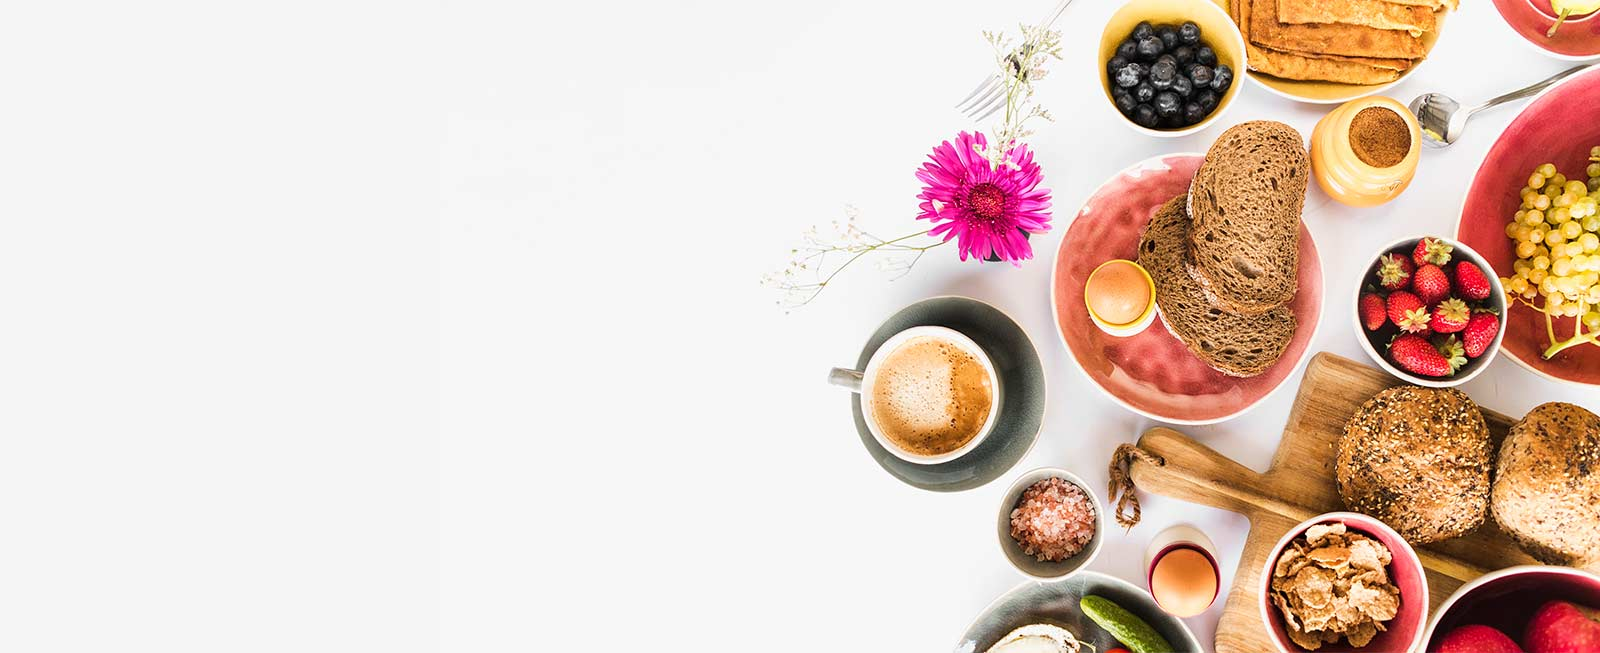 Gastronomía Protur Naisa Plama